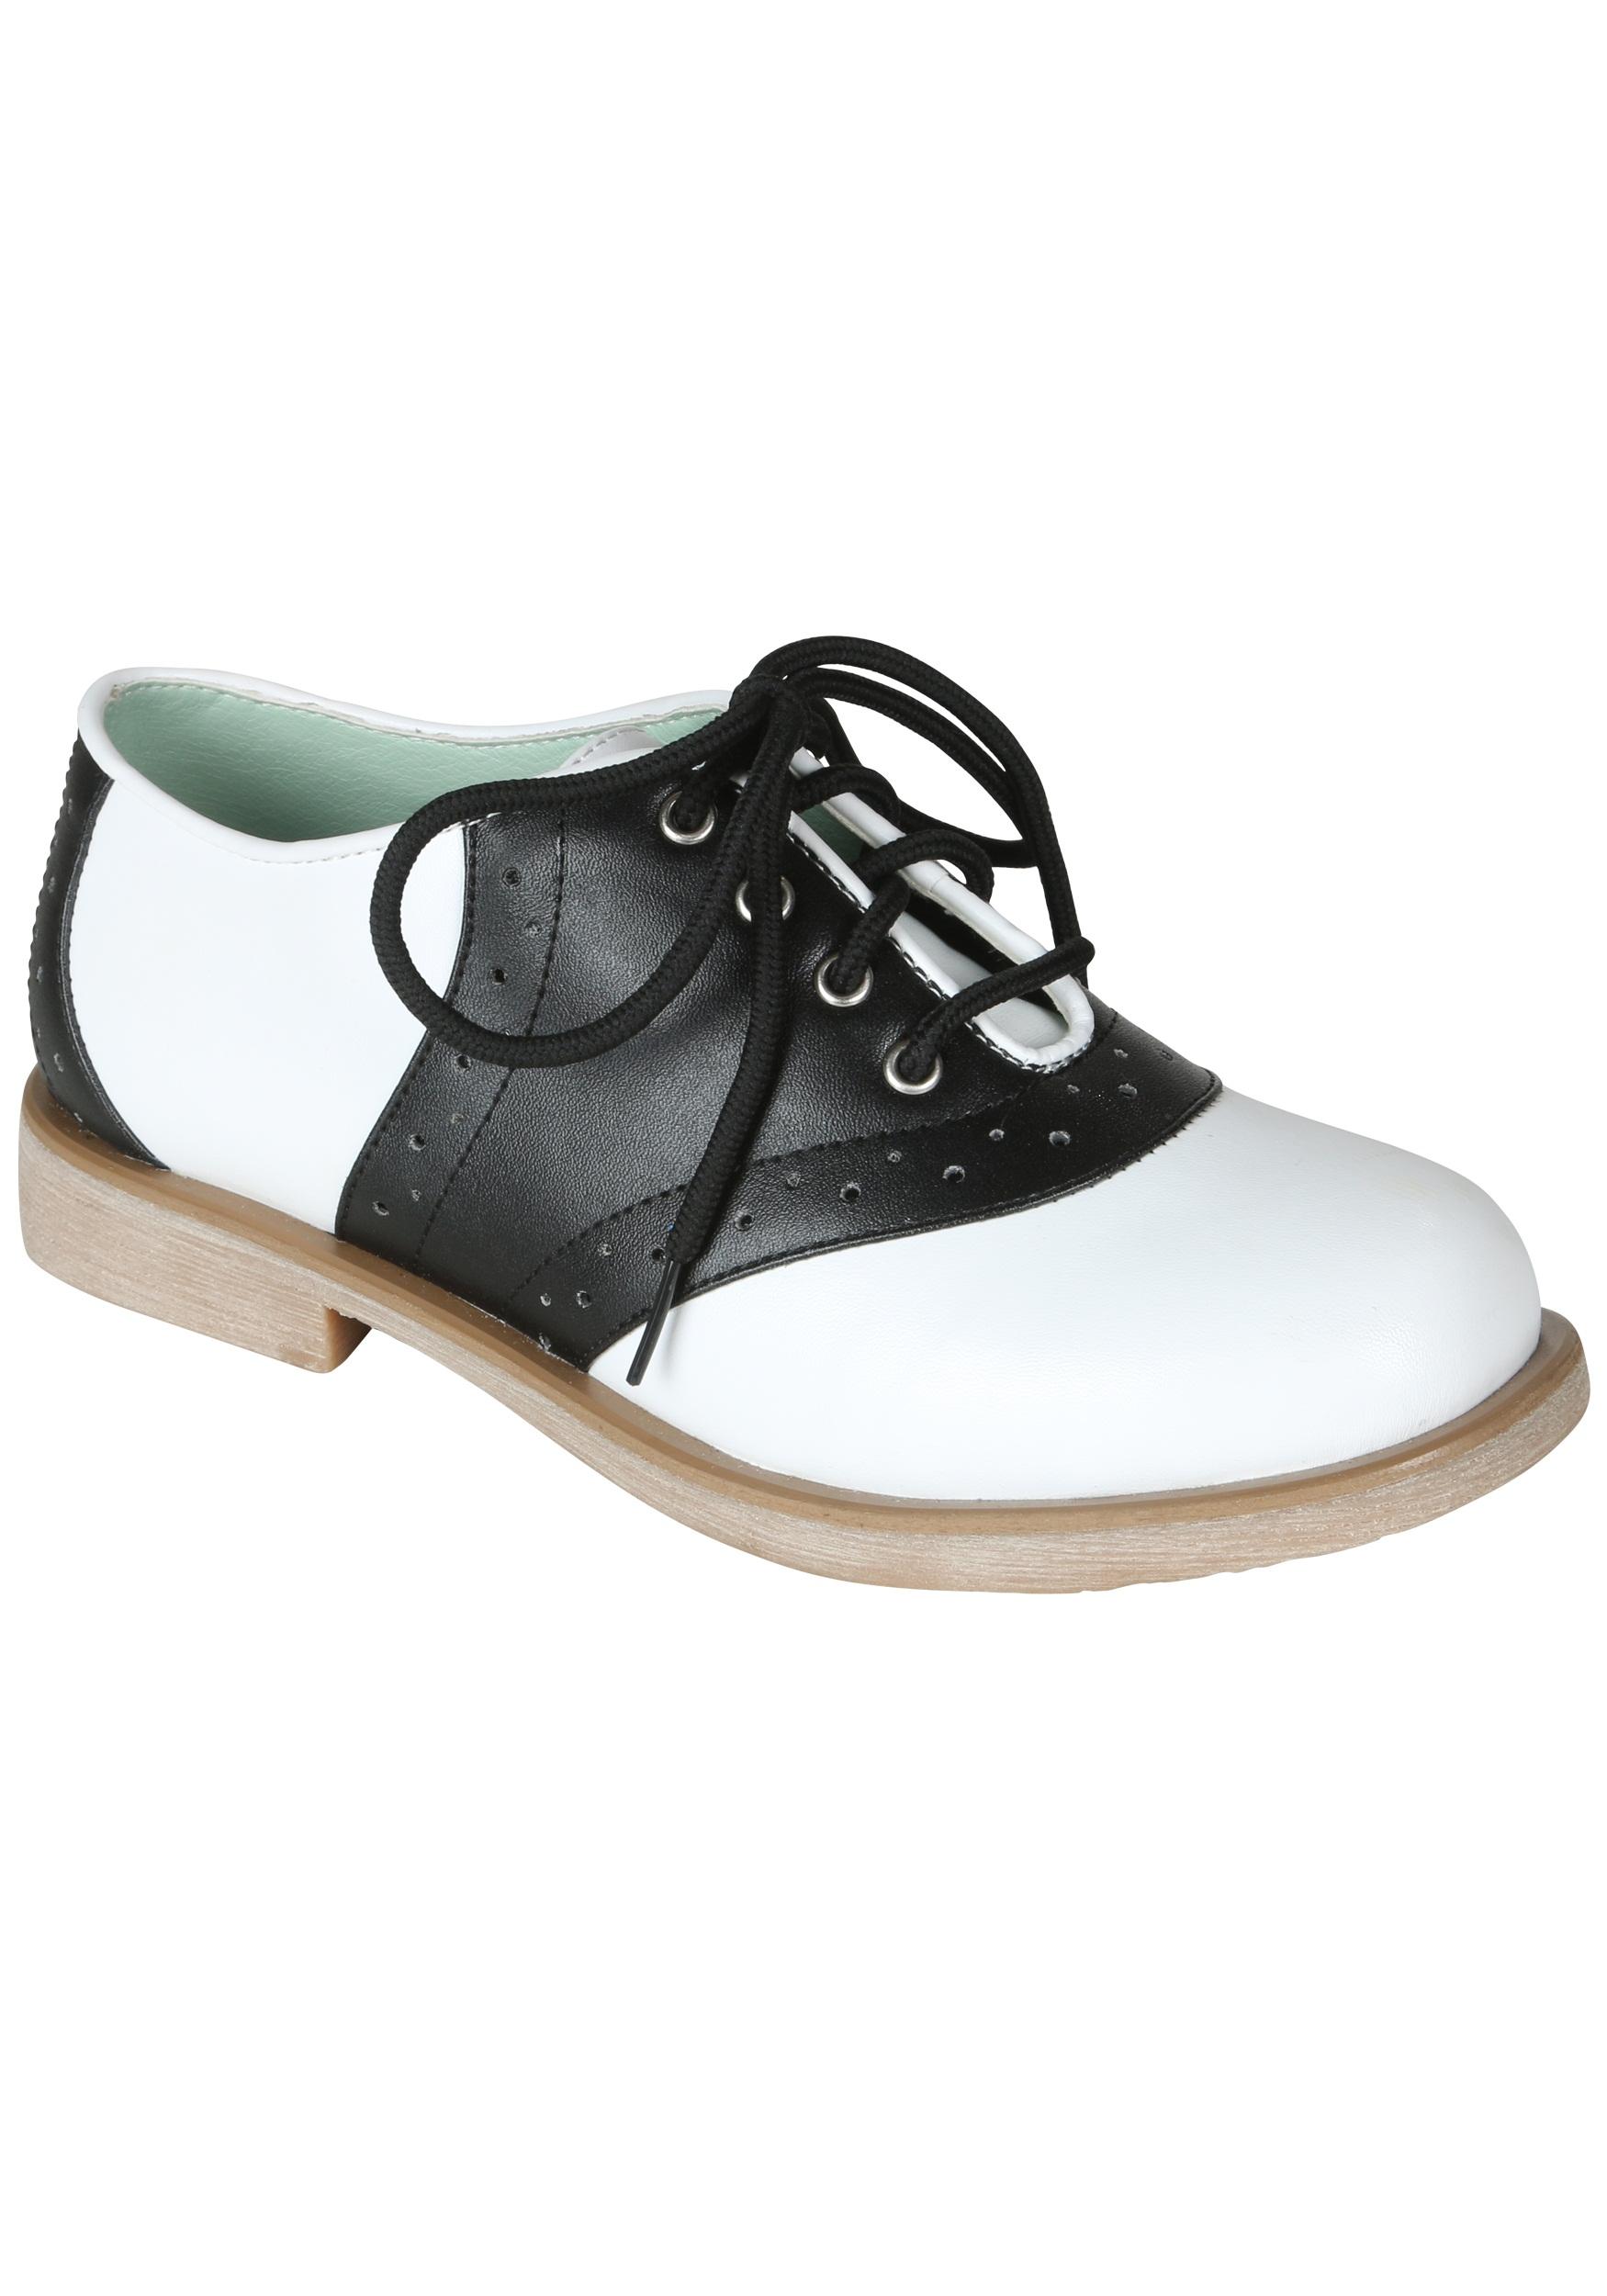 Womenu0027s Saddle Shoes  sc 1 st  Fun.com & Costume Saddle Shoes for Women